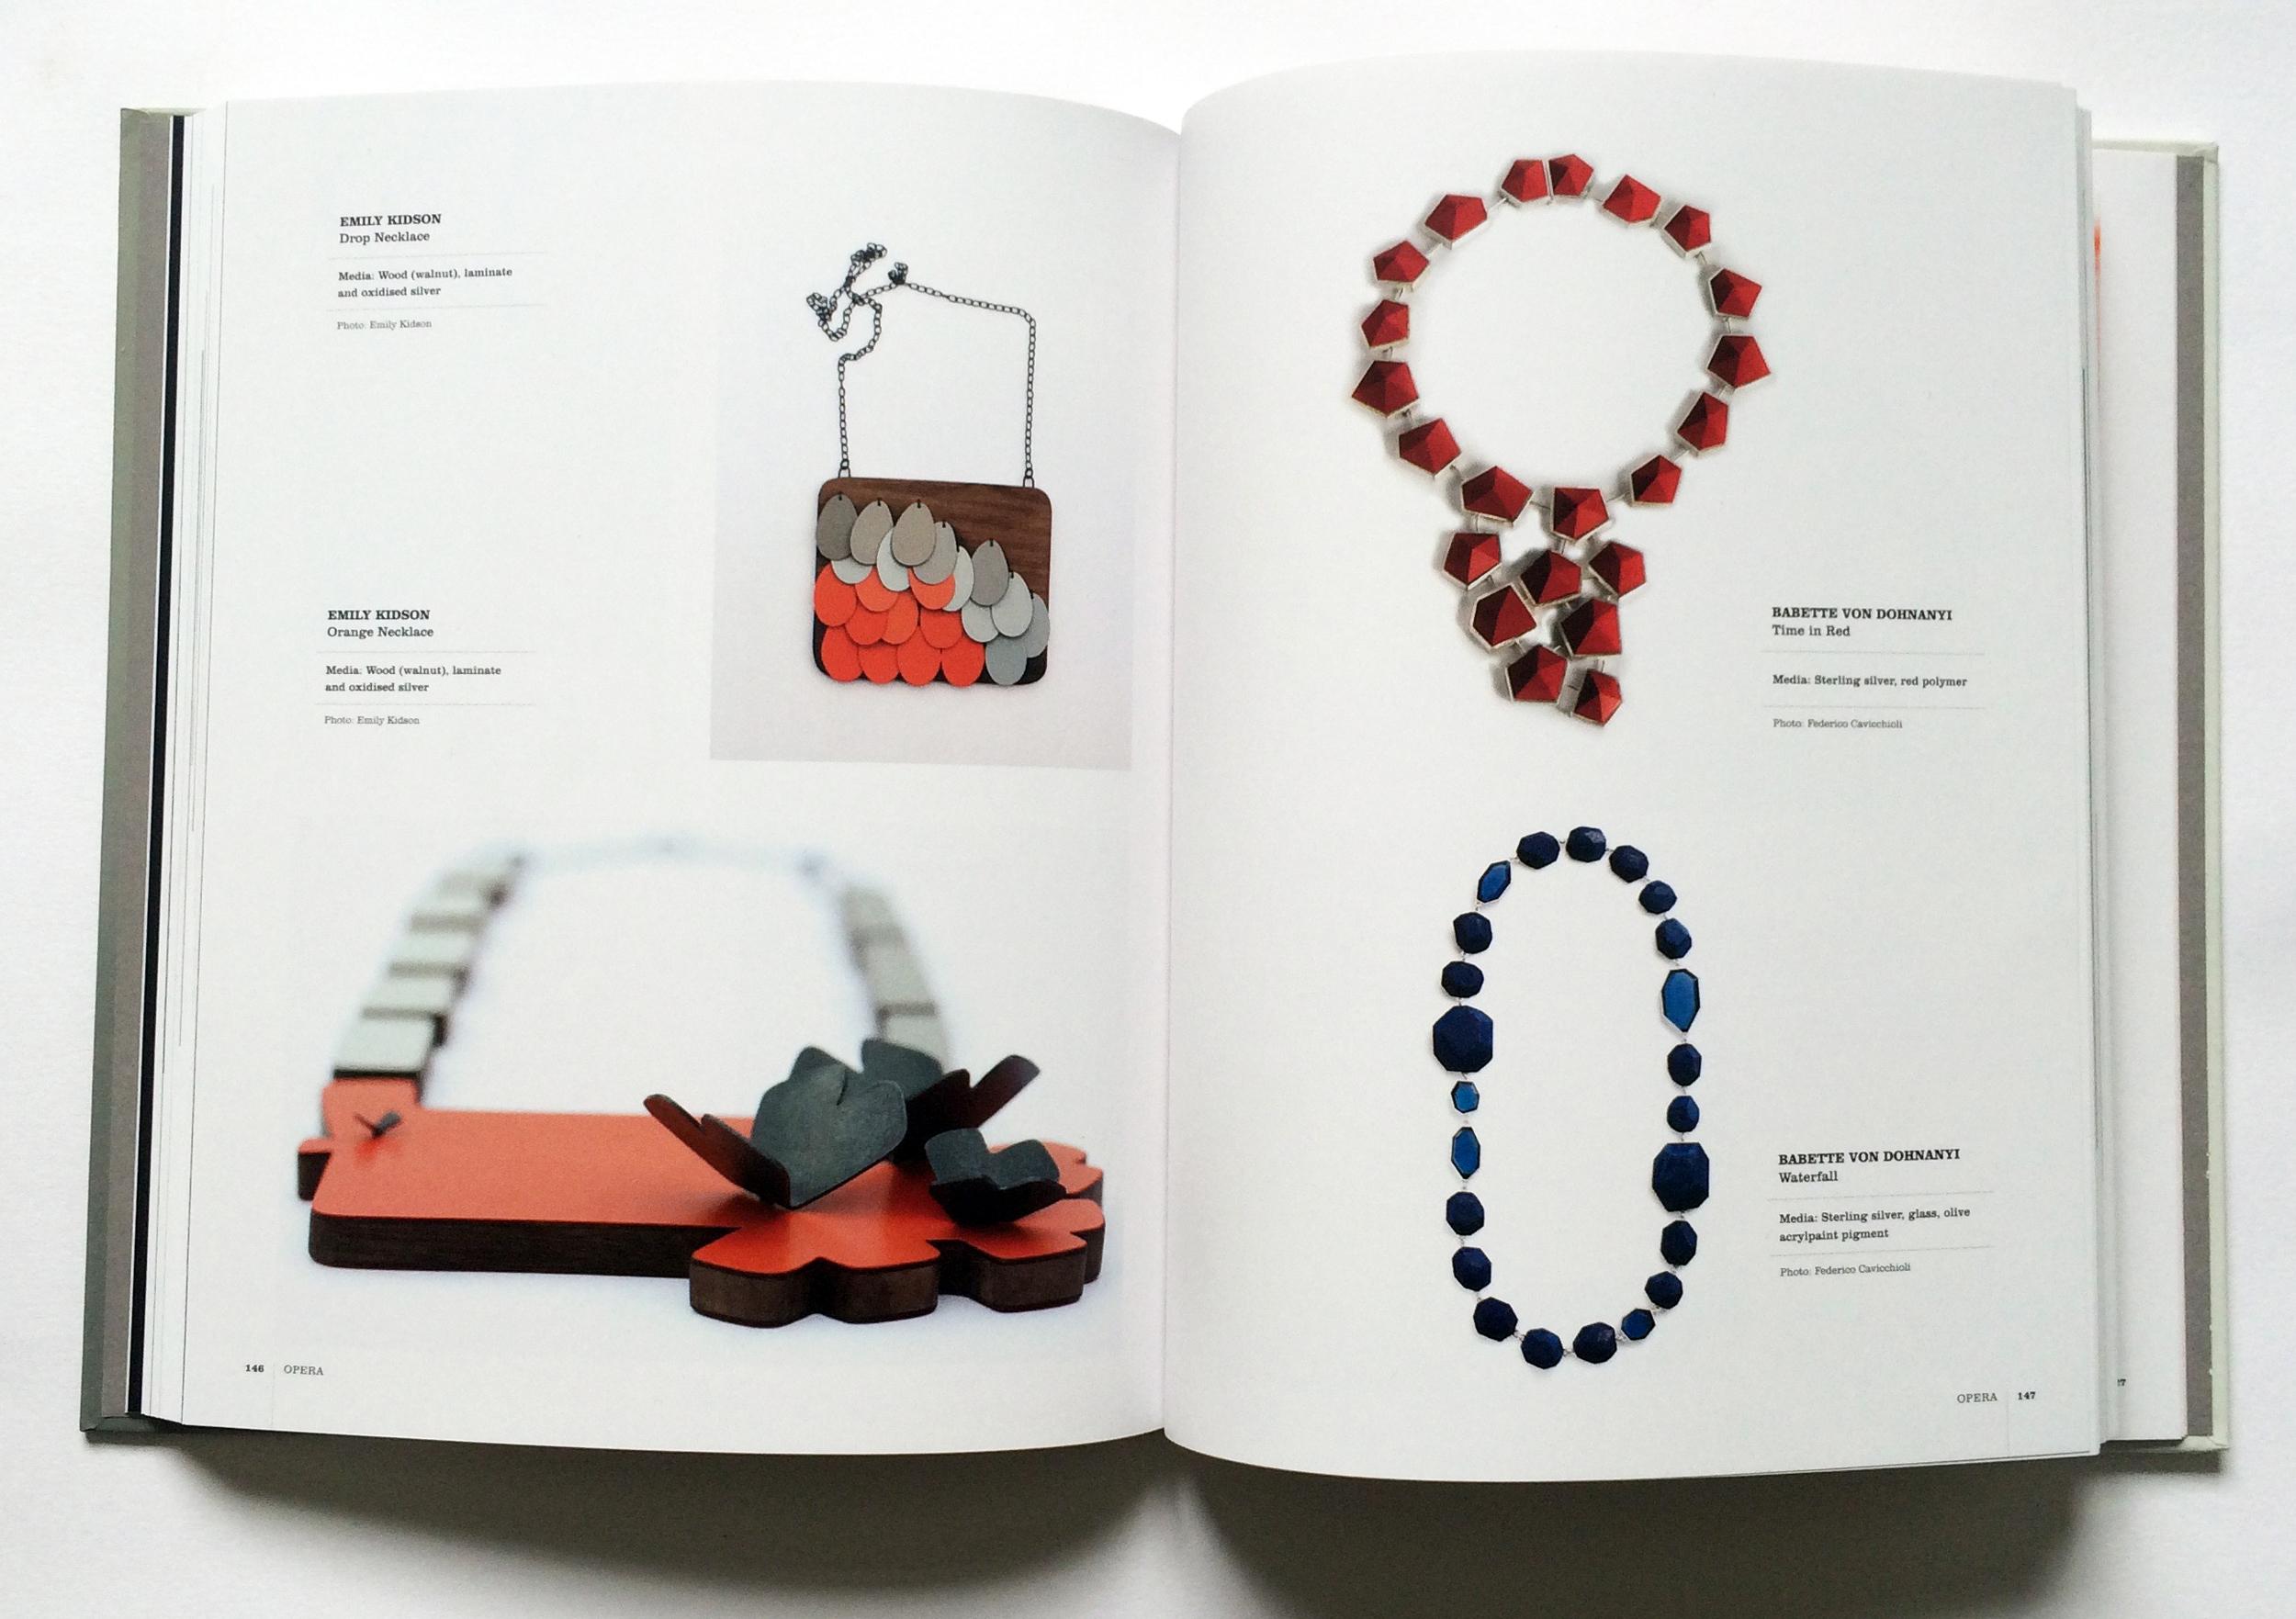 New-necklaces-1.jpg